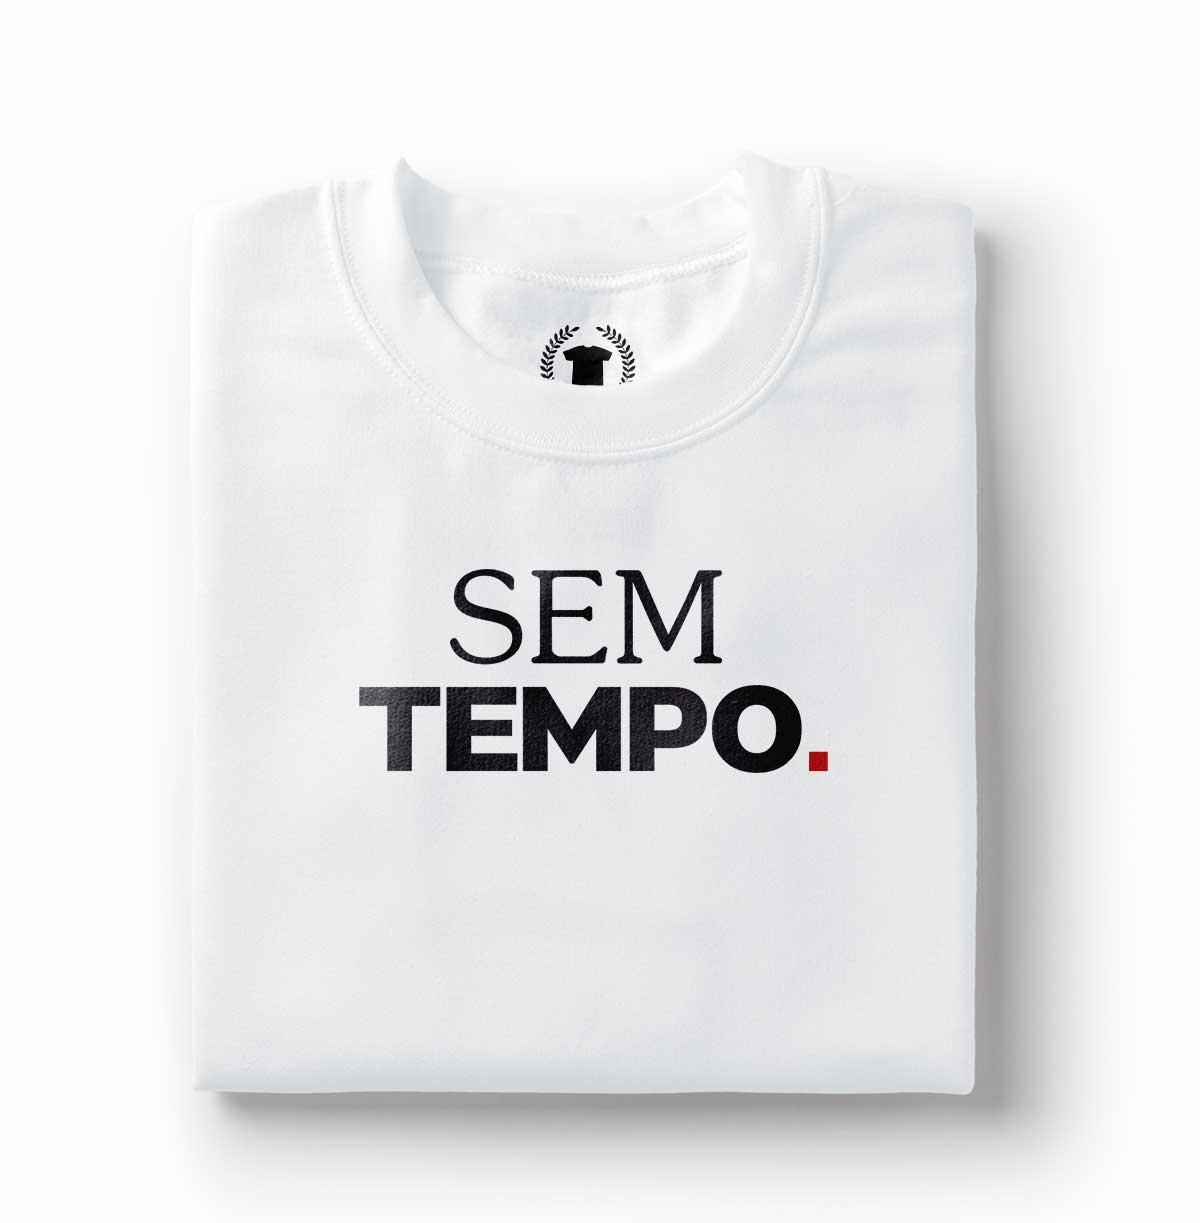 camiseta sem tempo frases estampadas